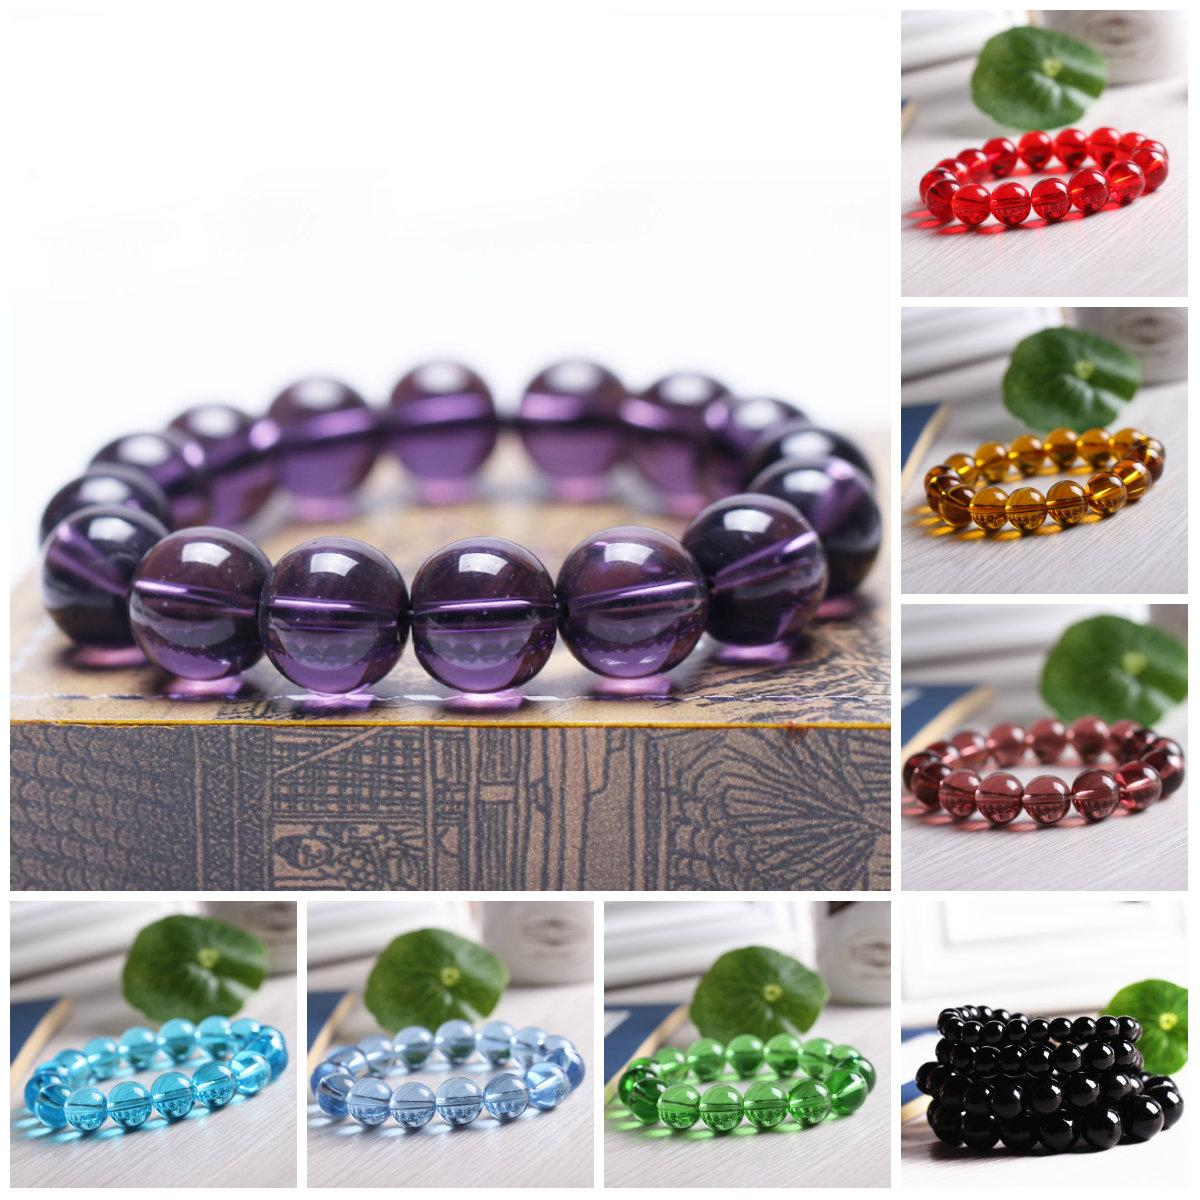 Beaded Bracelets Stretch 8mm Natural Stone Bracelet Pretty Jewelry Carnelian Amethyst Round Beads Bracelet Purple Healing Crystal Bracelets